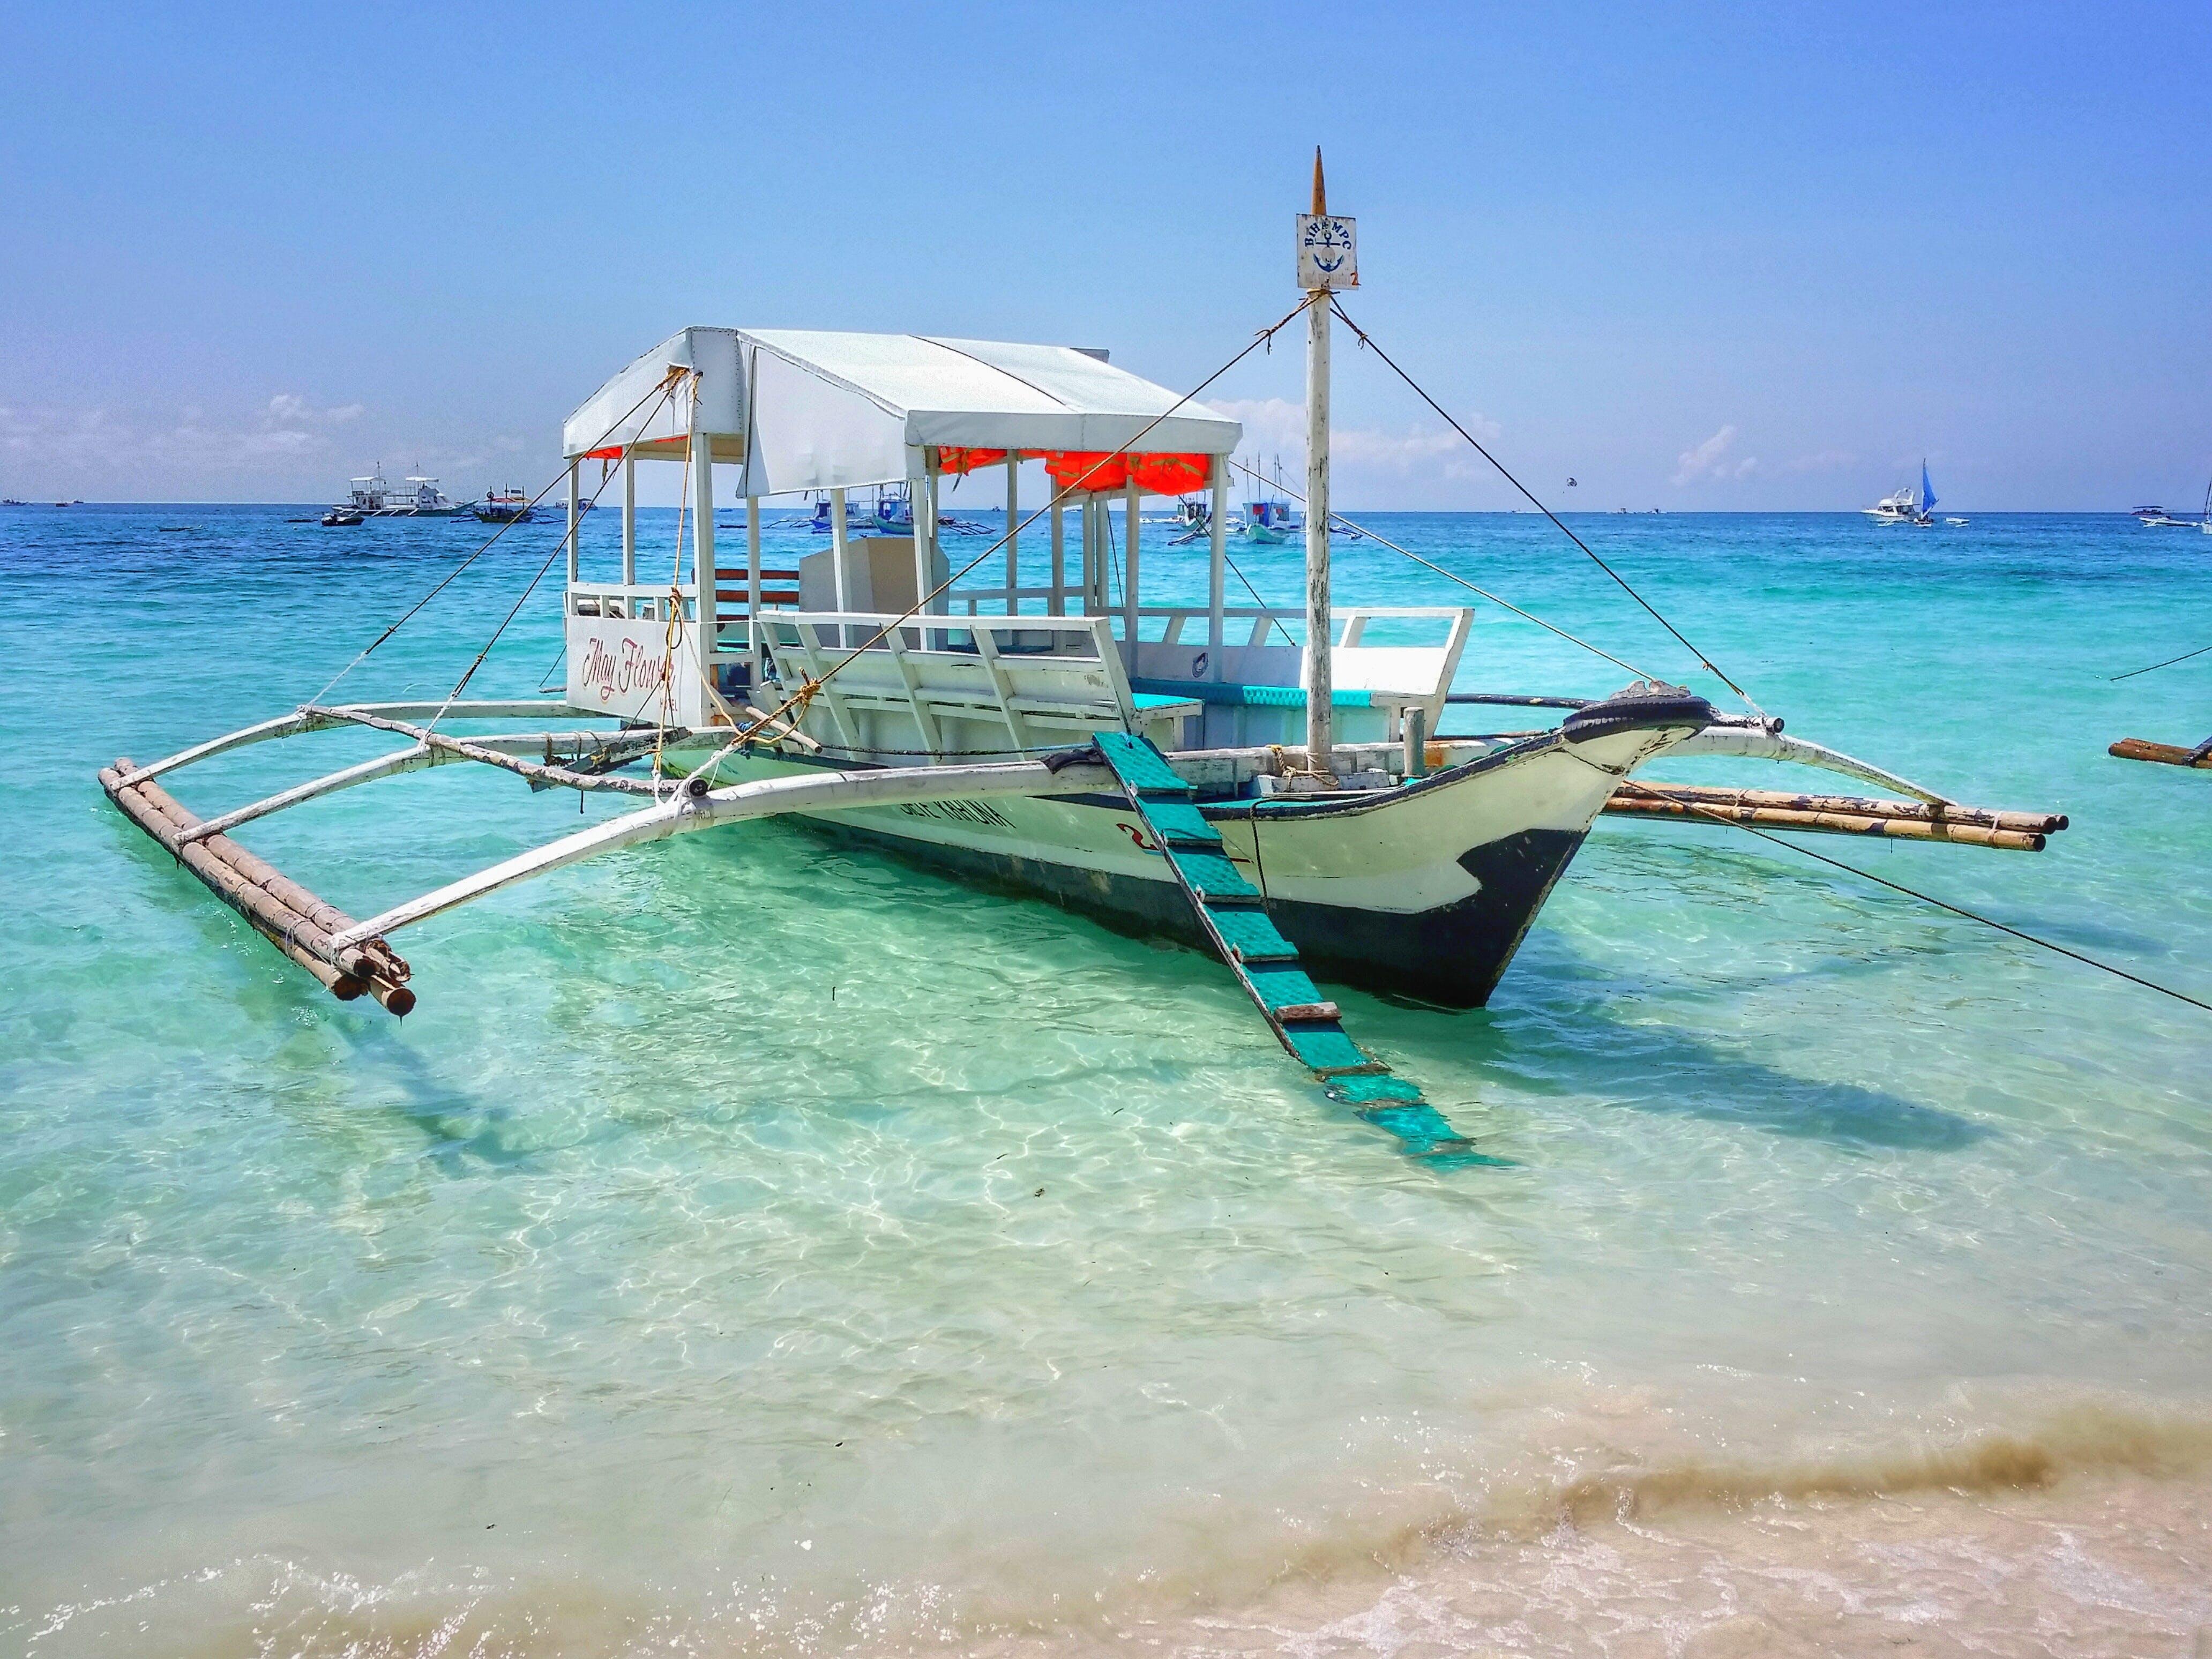 White Wooden Boat in Seashore